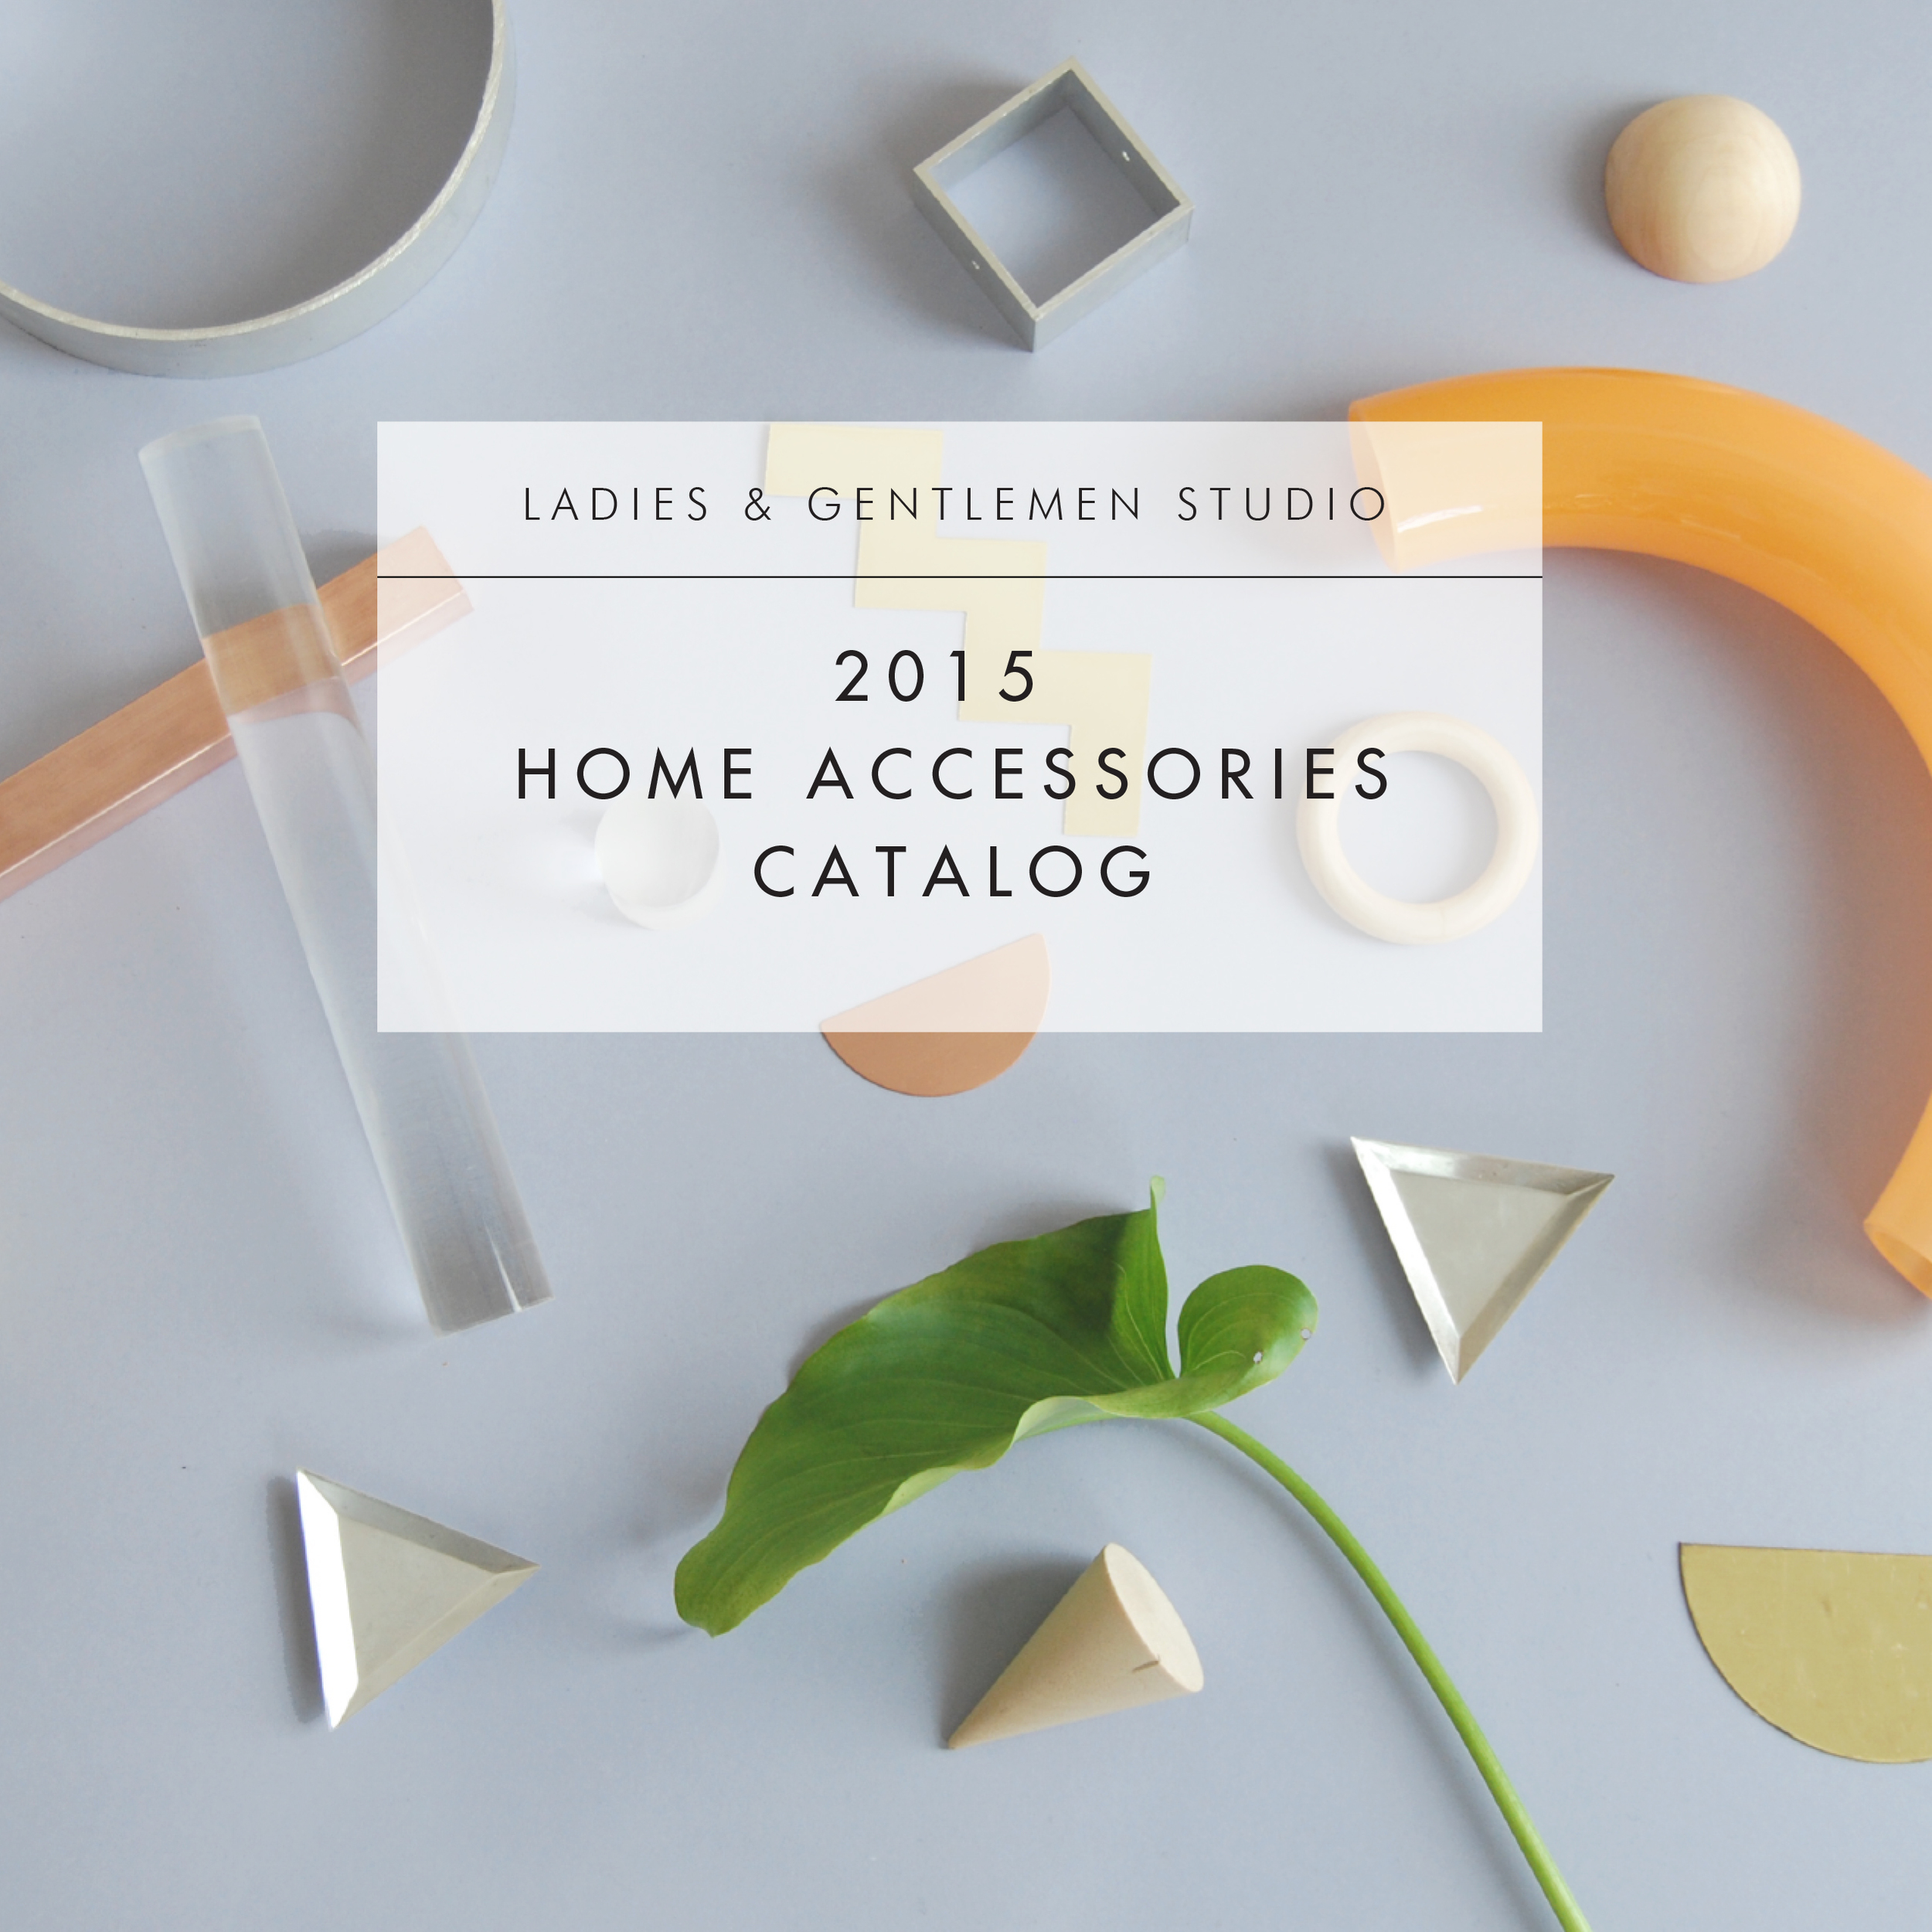 2015 LG STUDIO accessories catalog-1.jpg